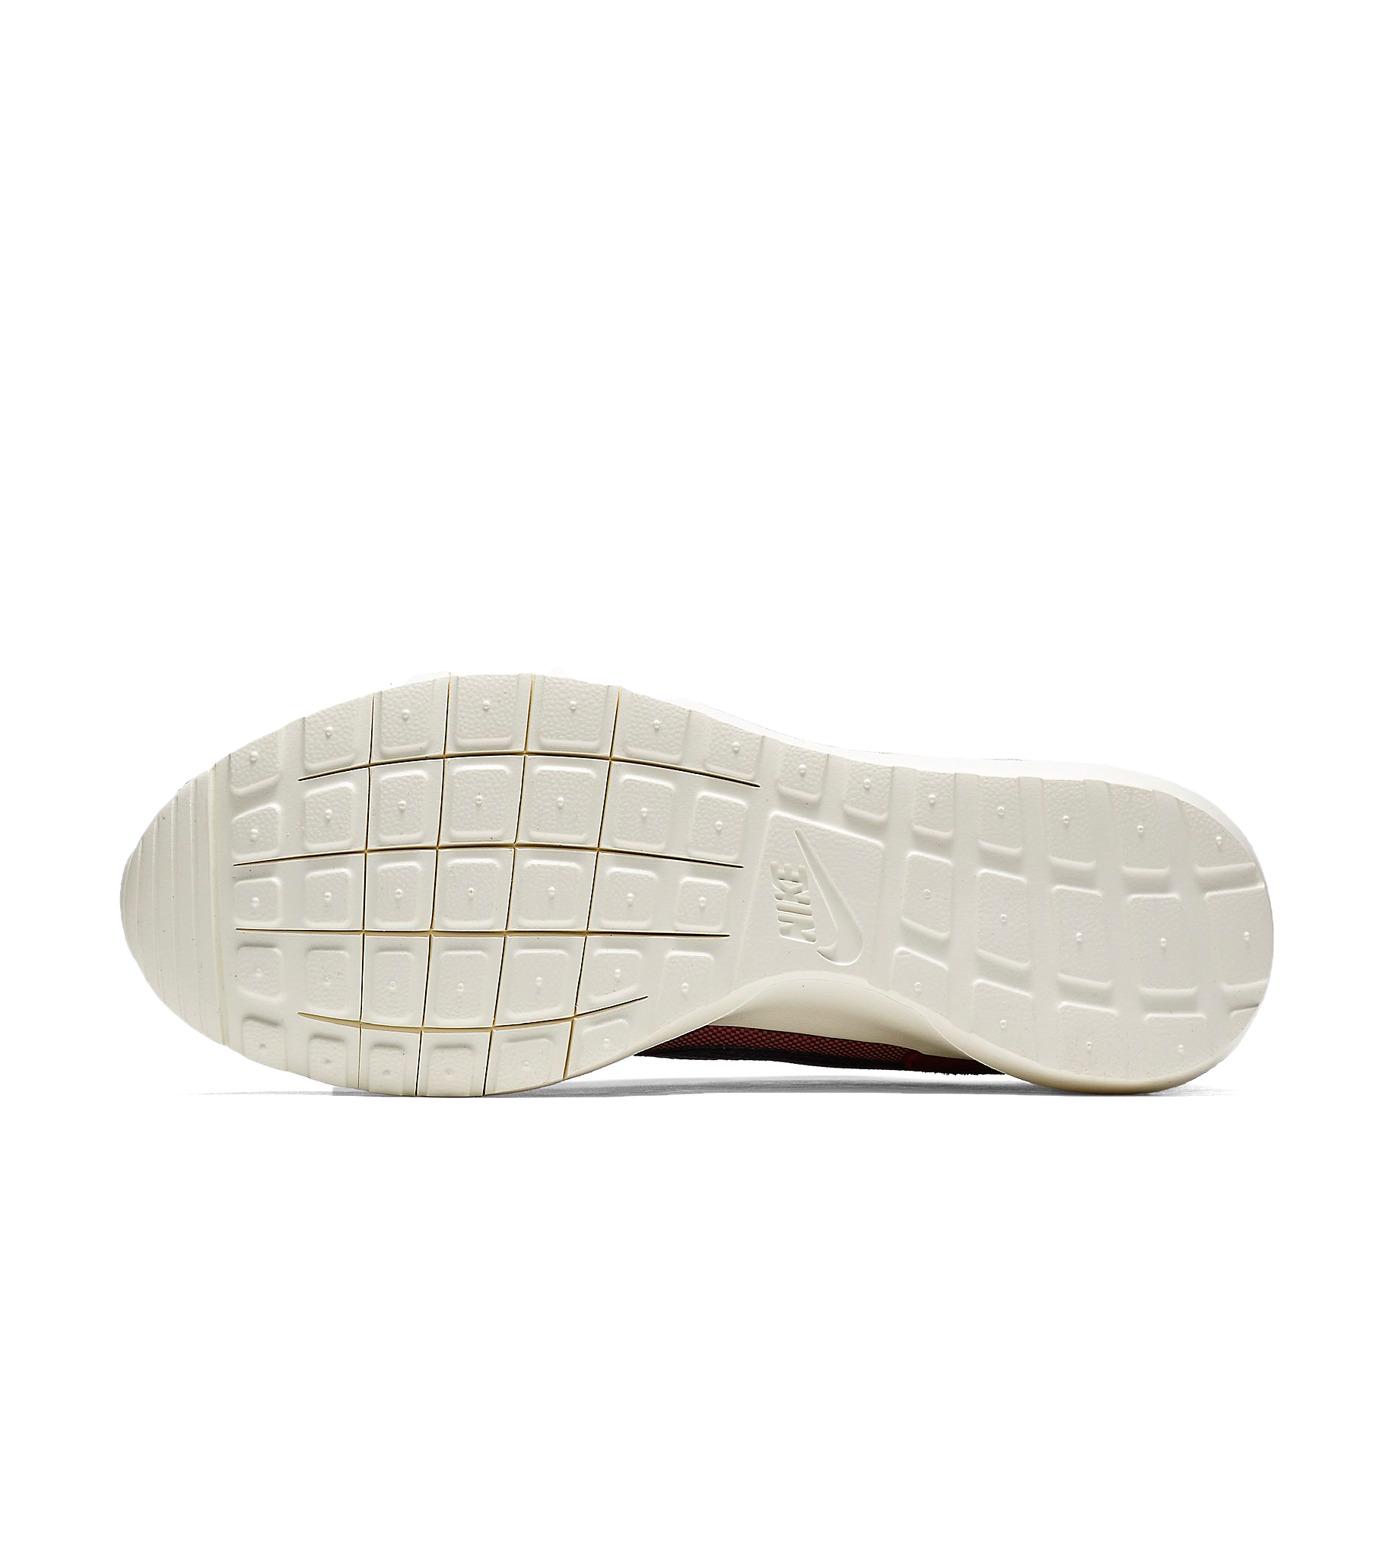 NIKE(ナイキ)のROSHE DBREAK NM-SMOKE PINK(シューズ/shoes)-826666-604-74 拡大詳細画像2